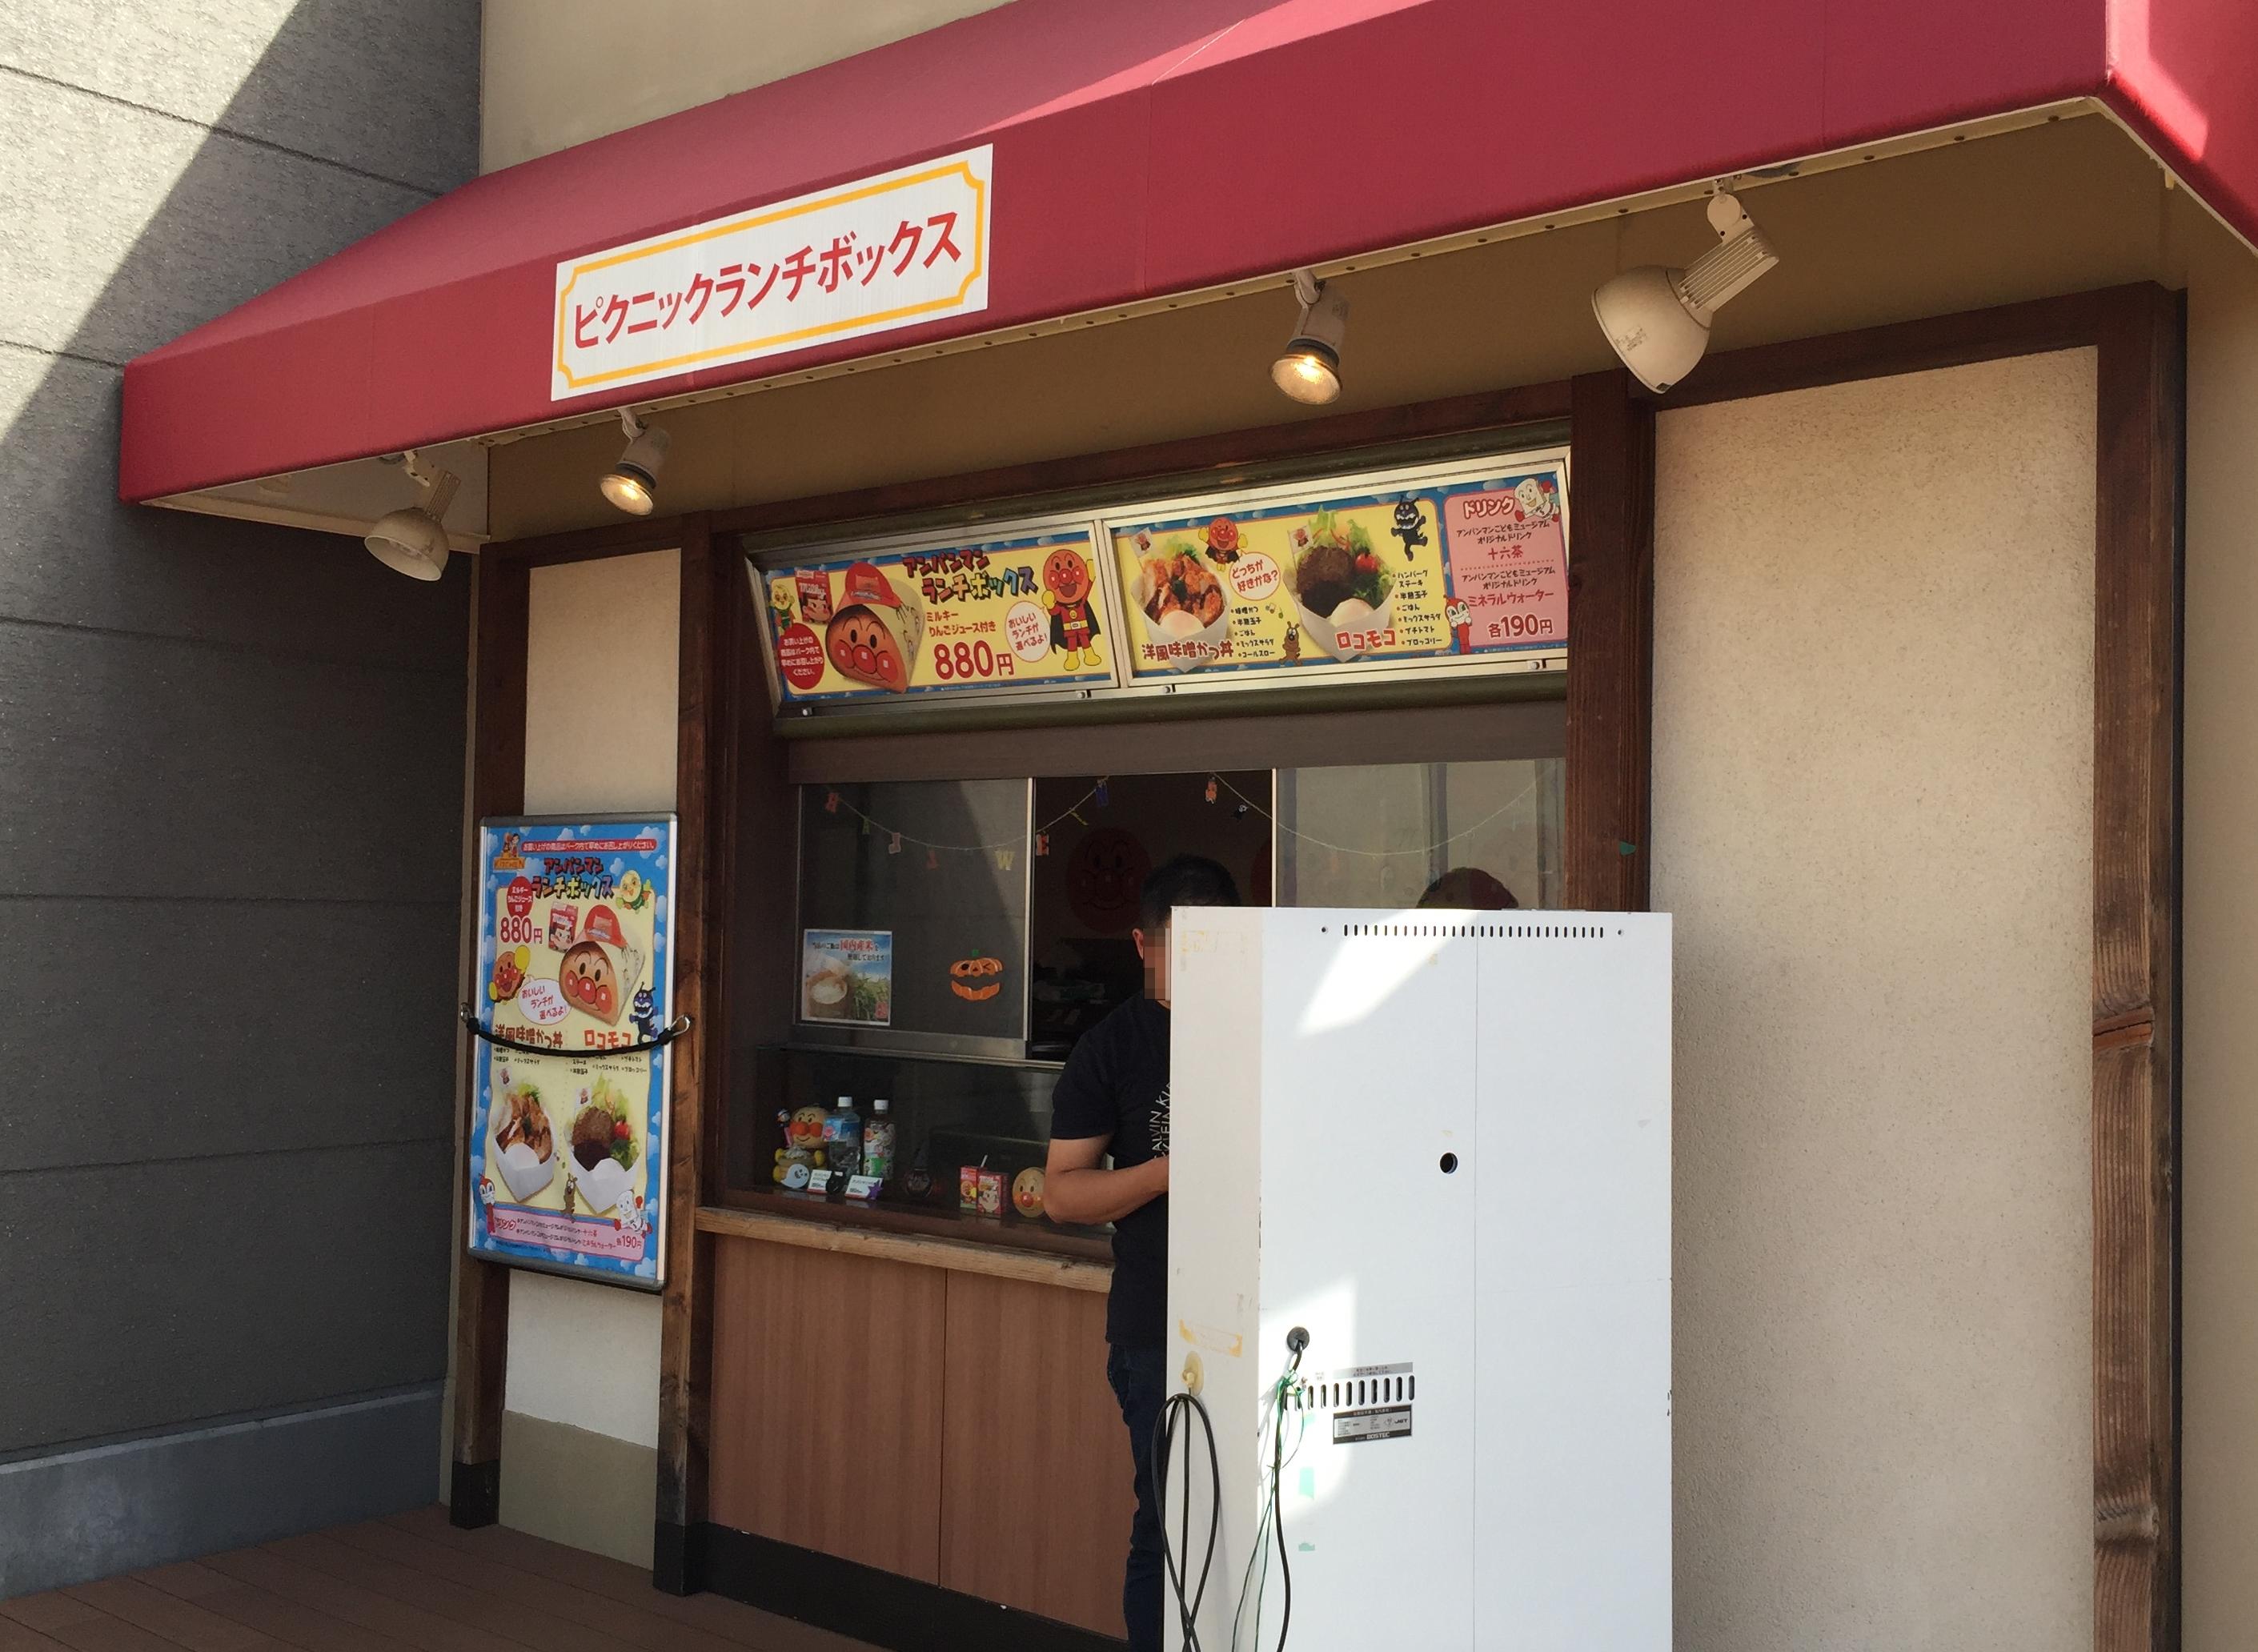 nagoya-anpanman-meal